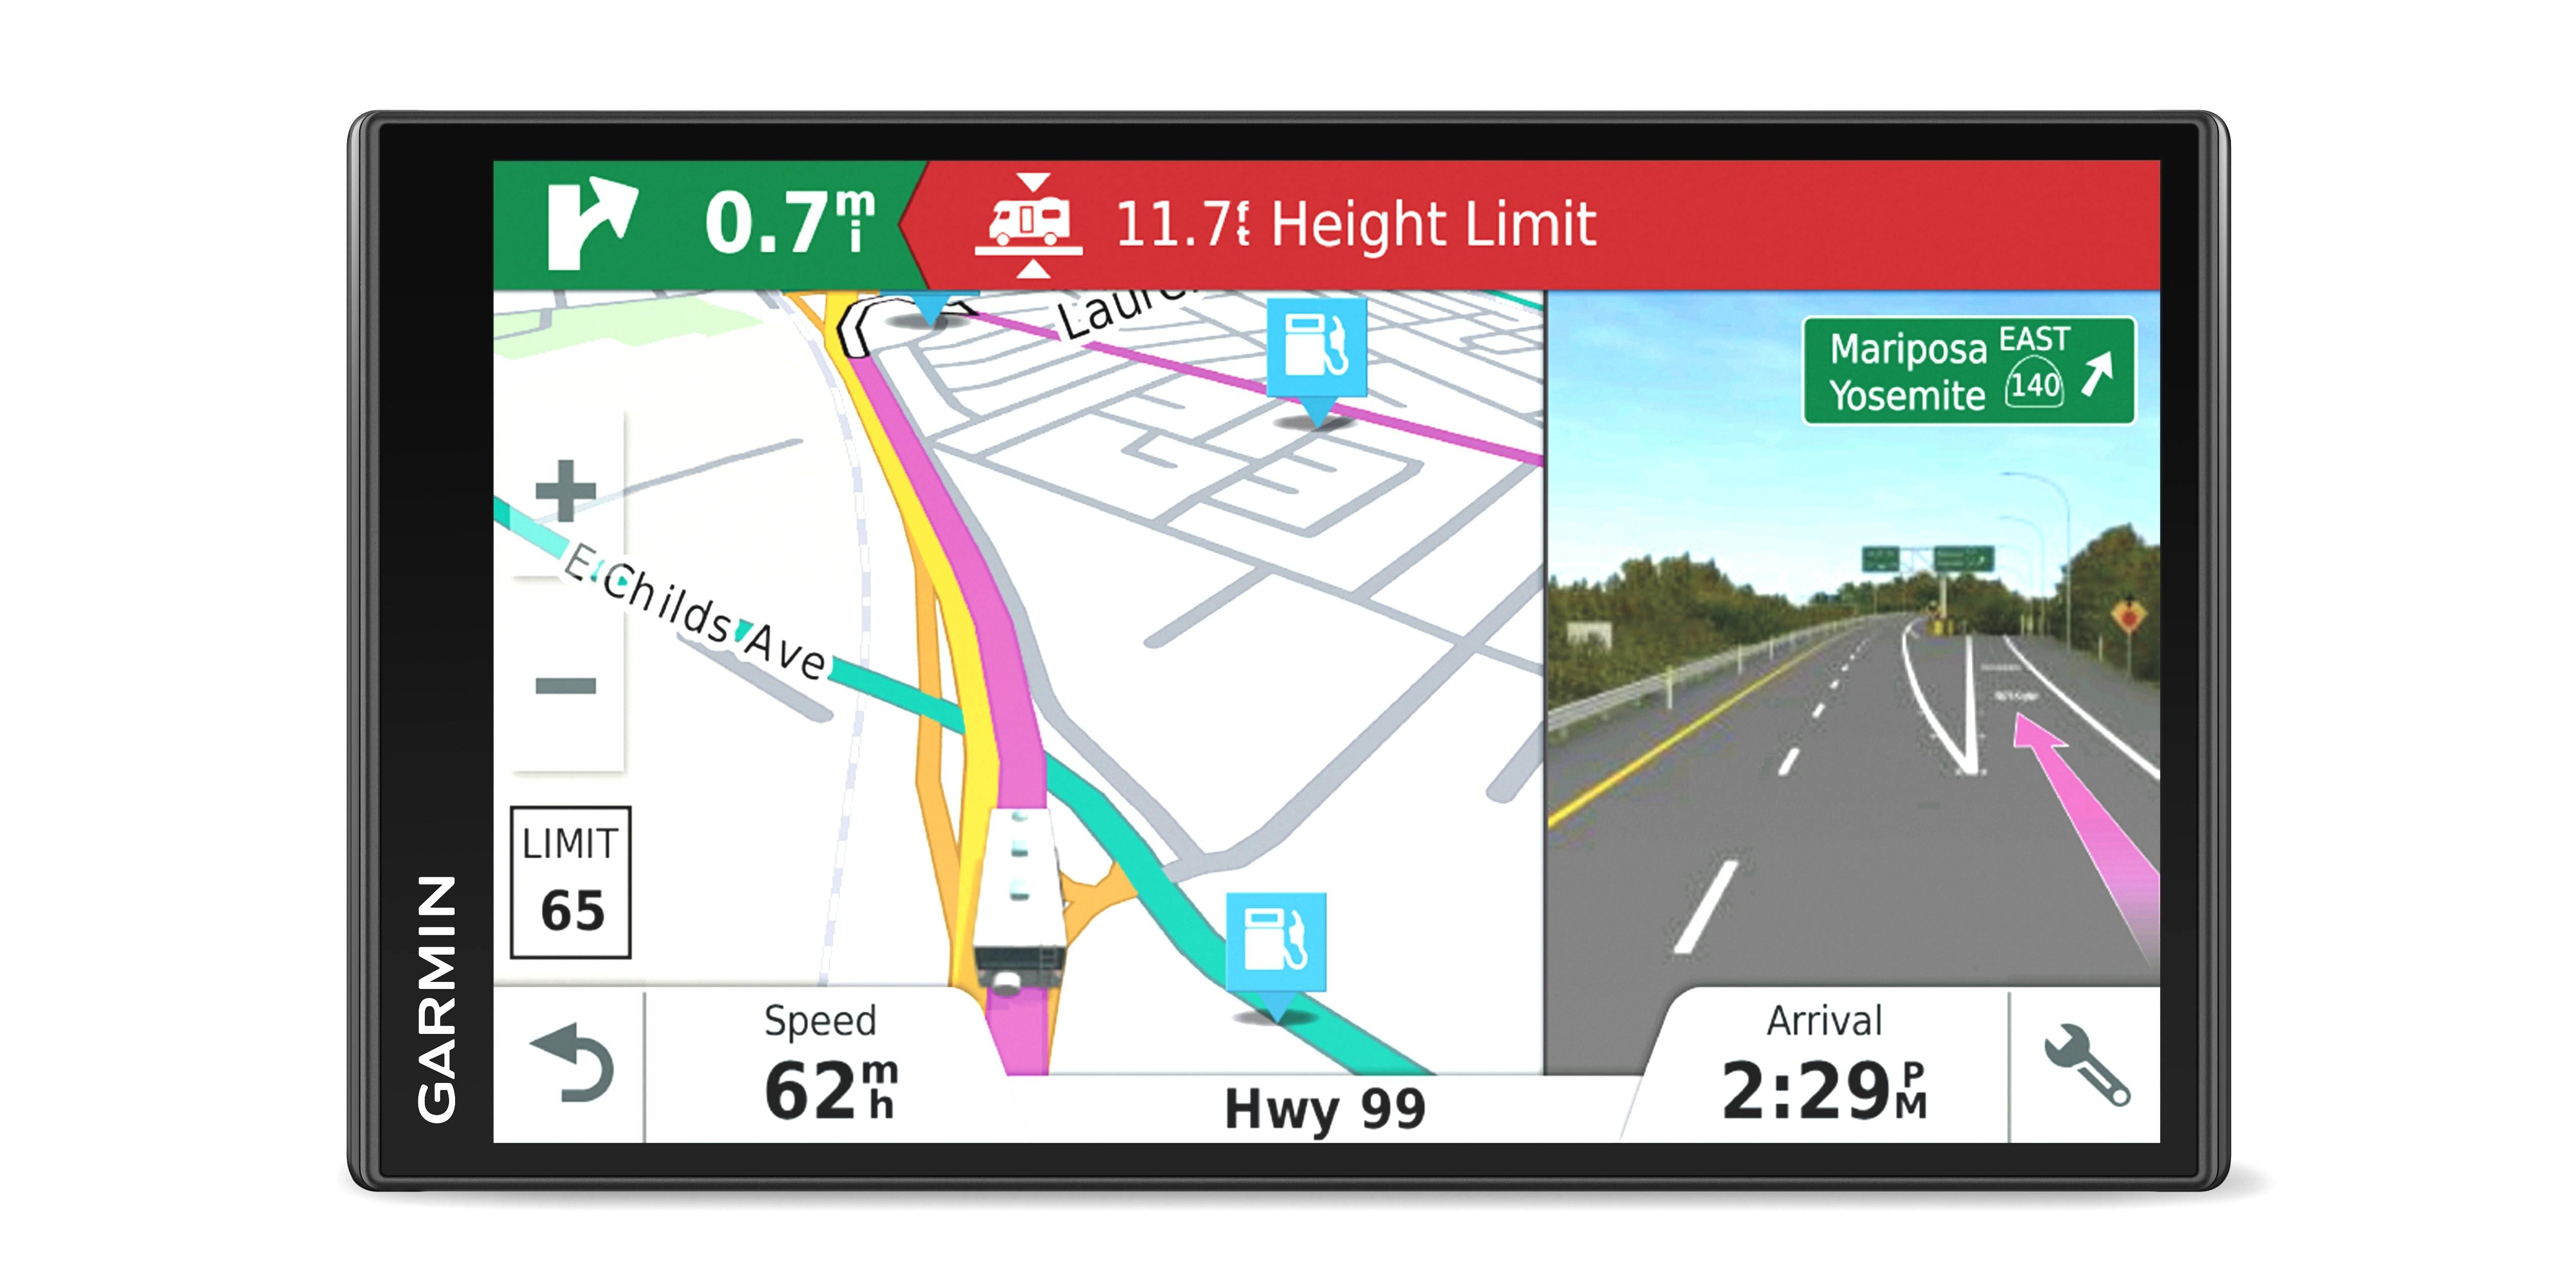 5100x2550 Garmin Us Canada Maps Download Garmin Us And Canada Map Vector Usa